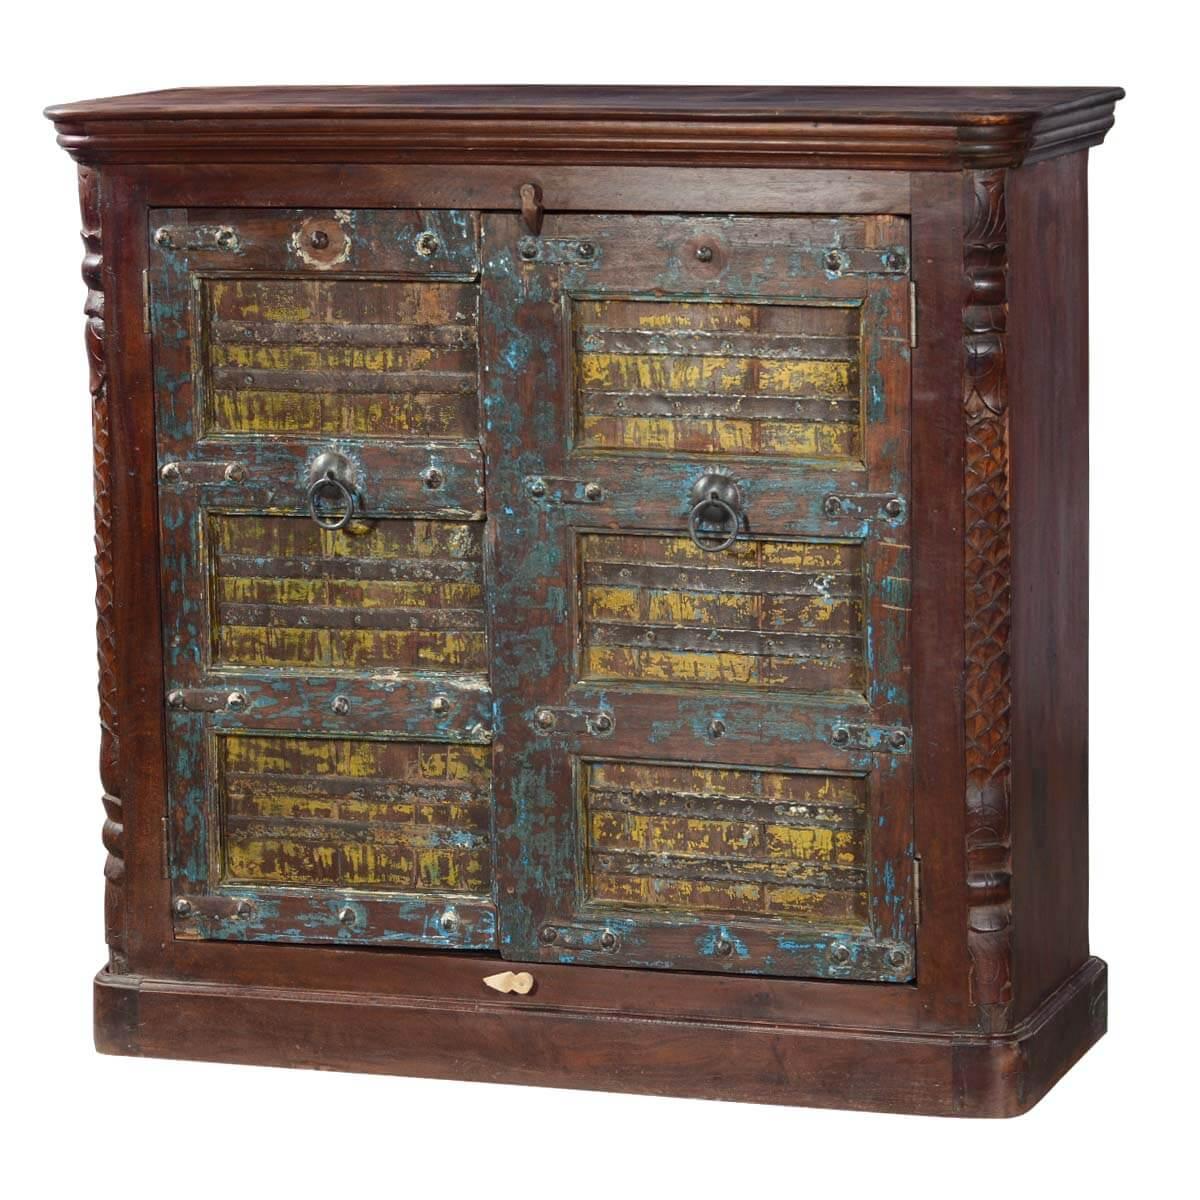 Newberry reclaimed wood handcrafted door storage cabinet hover to zoom